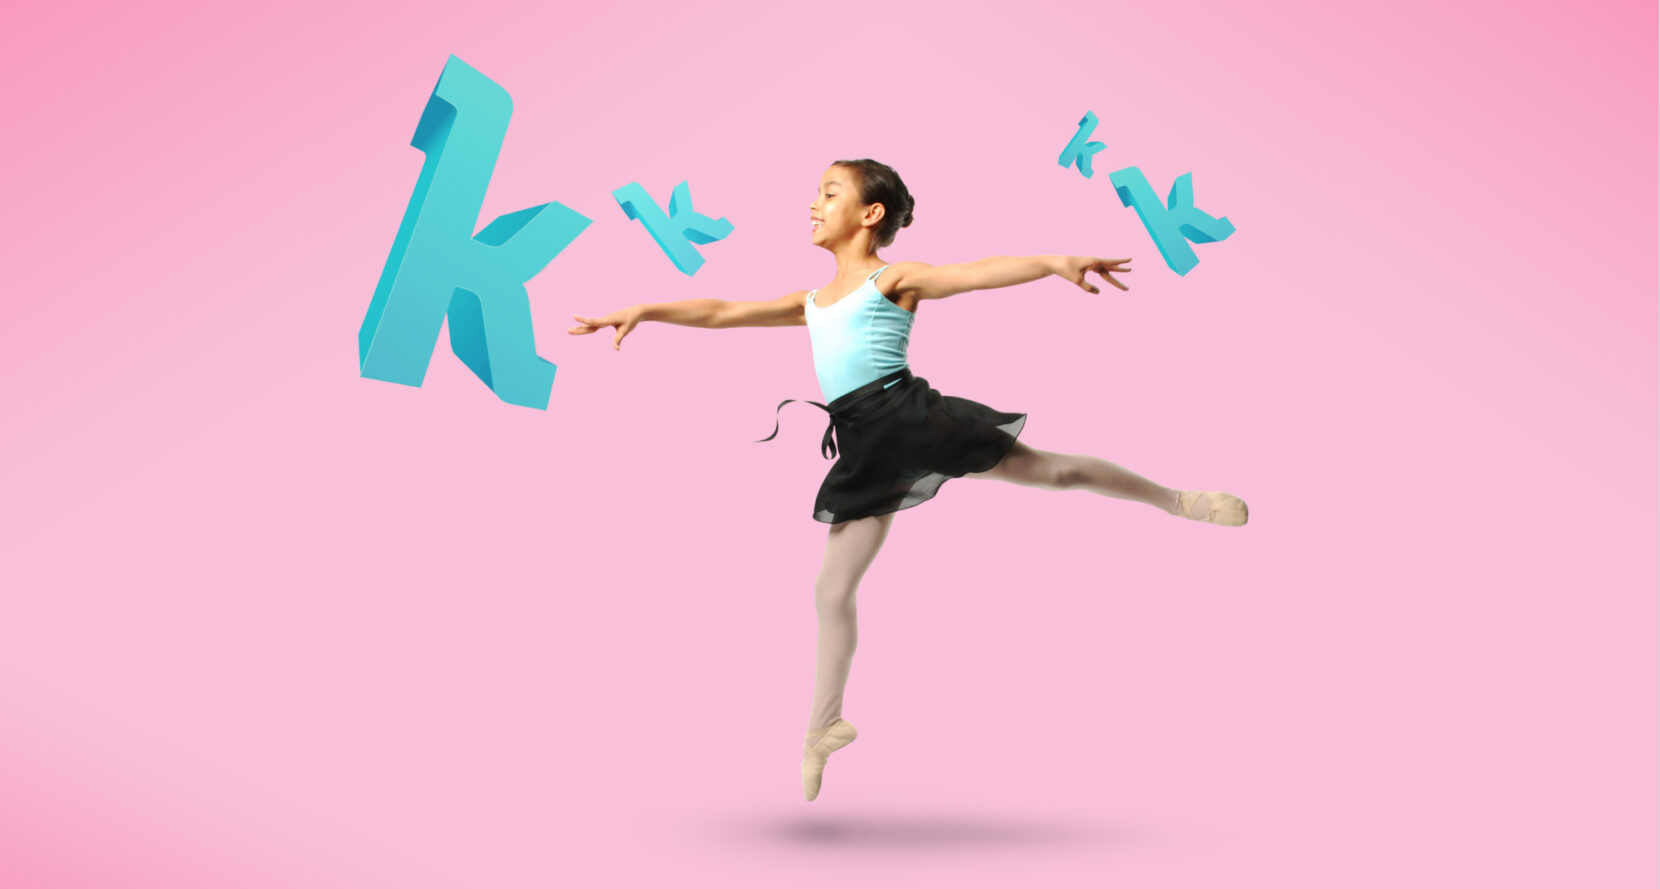 Kaliber Ballerina